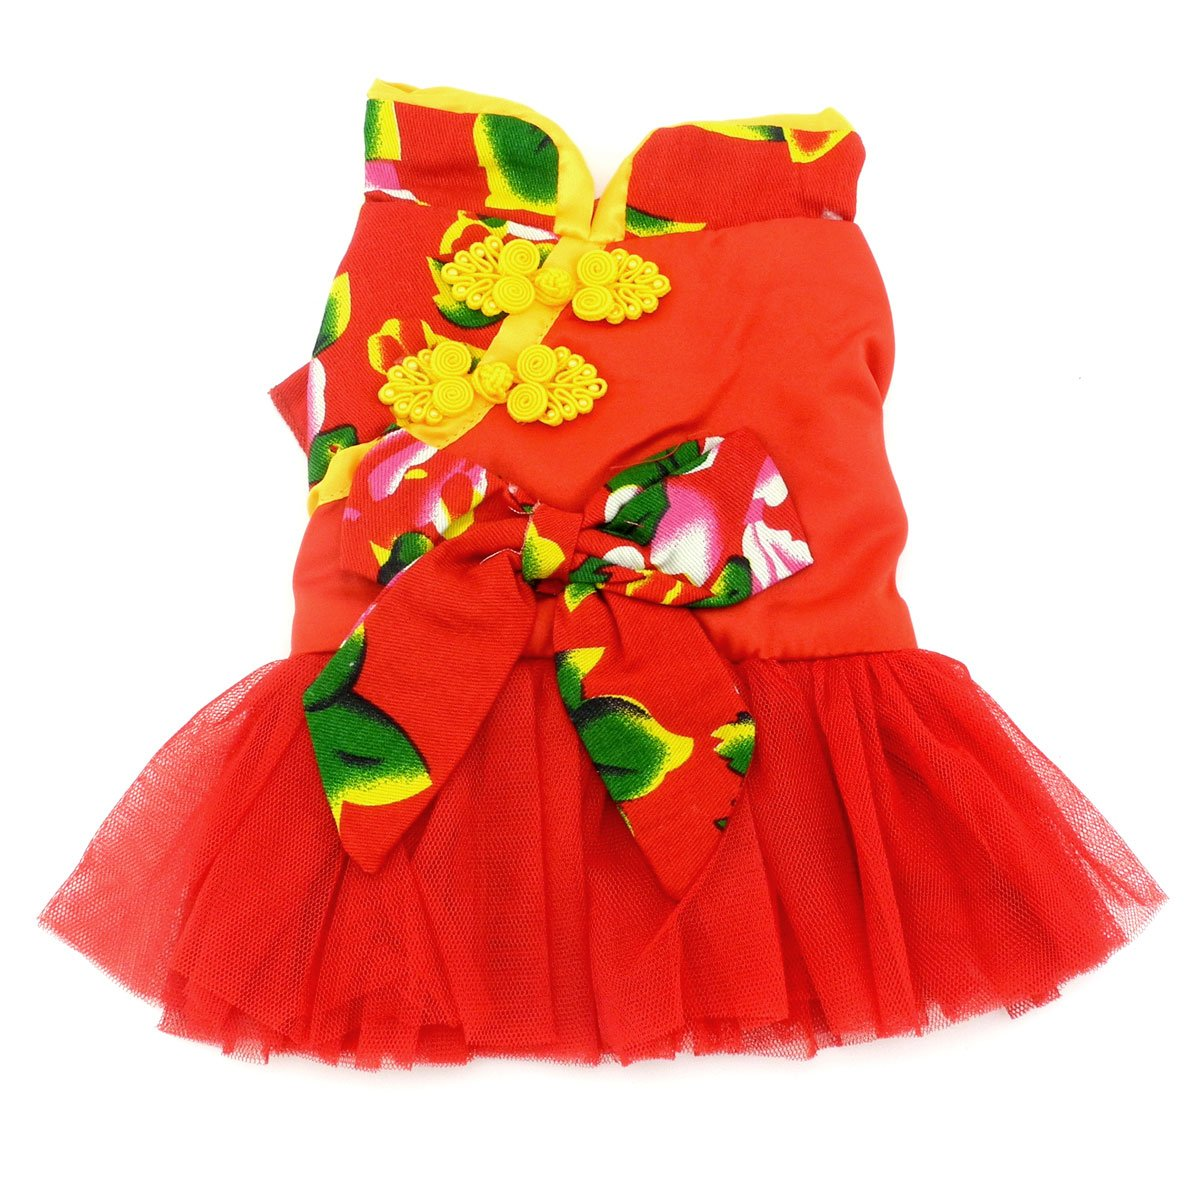 SMALLLEE_LUCKY_STORE Pet Chinese Traditional Wedding Dress, Medium